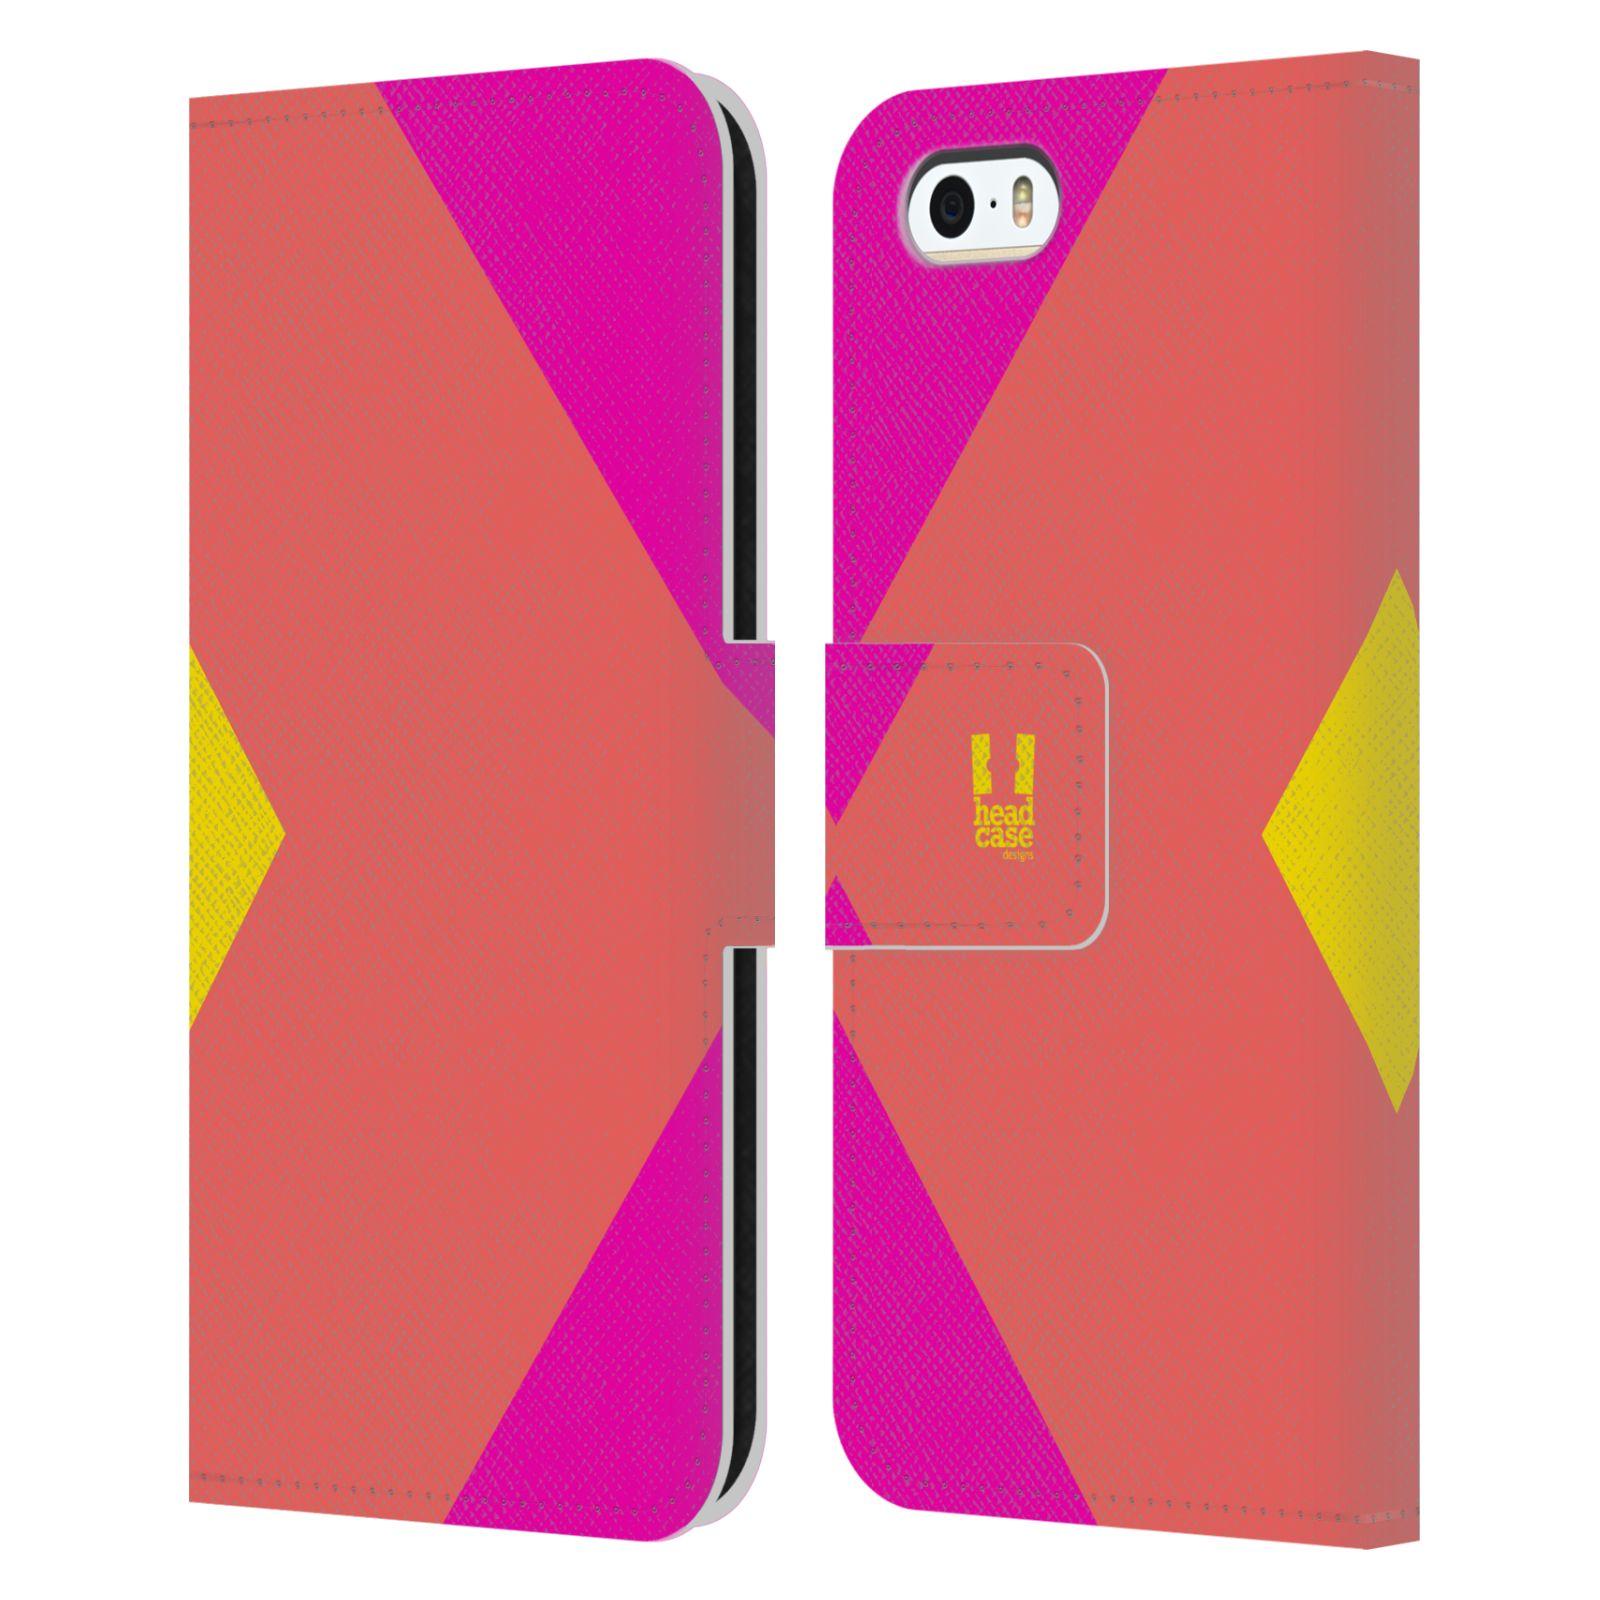 HEAD CASE Flipové pouzdro pro mobil Apple Iphone 5/5S barevné tvary růžová korál